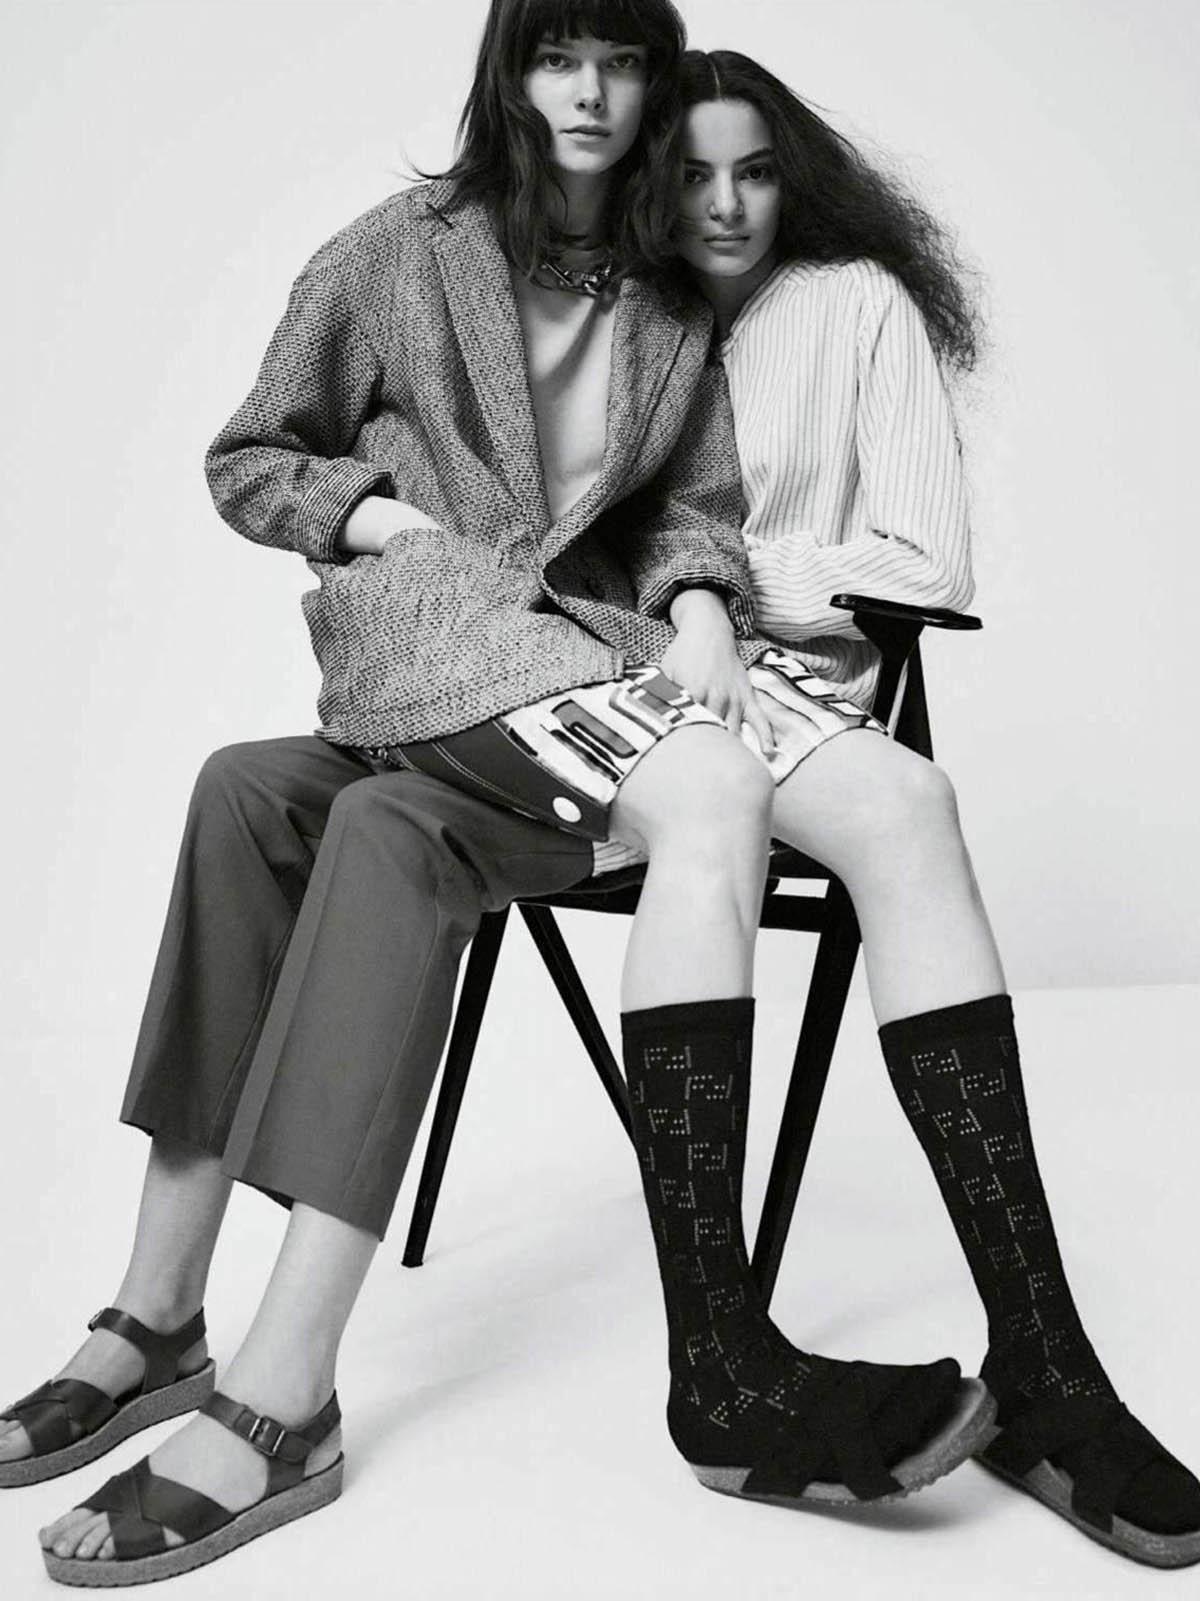 Alicia Athamnia and Zita Dobar by Julia Champeau for Elle France April 16th, 2021